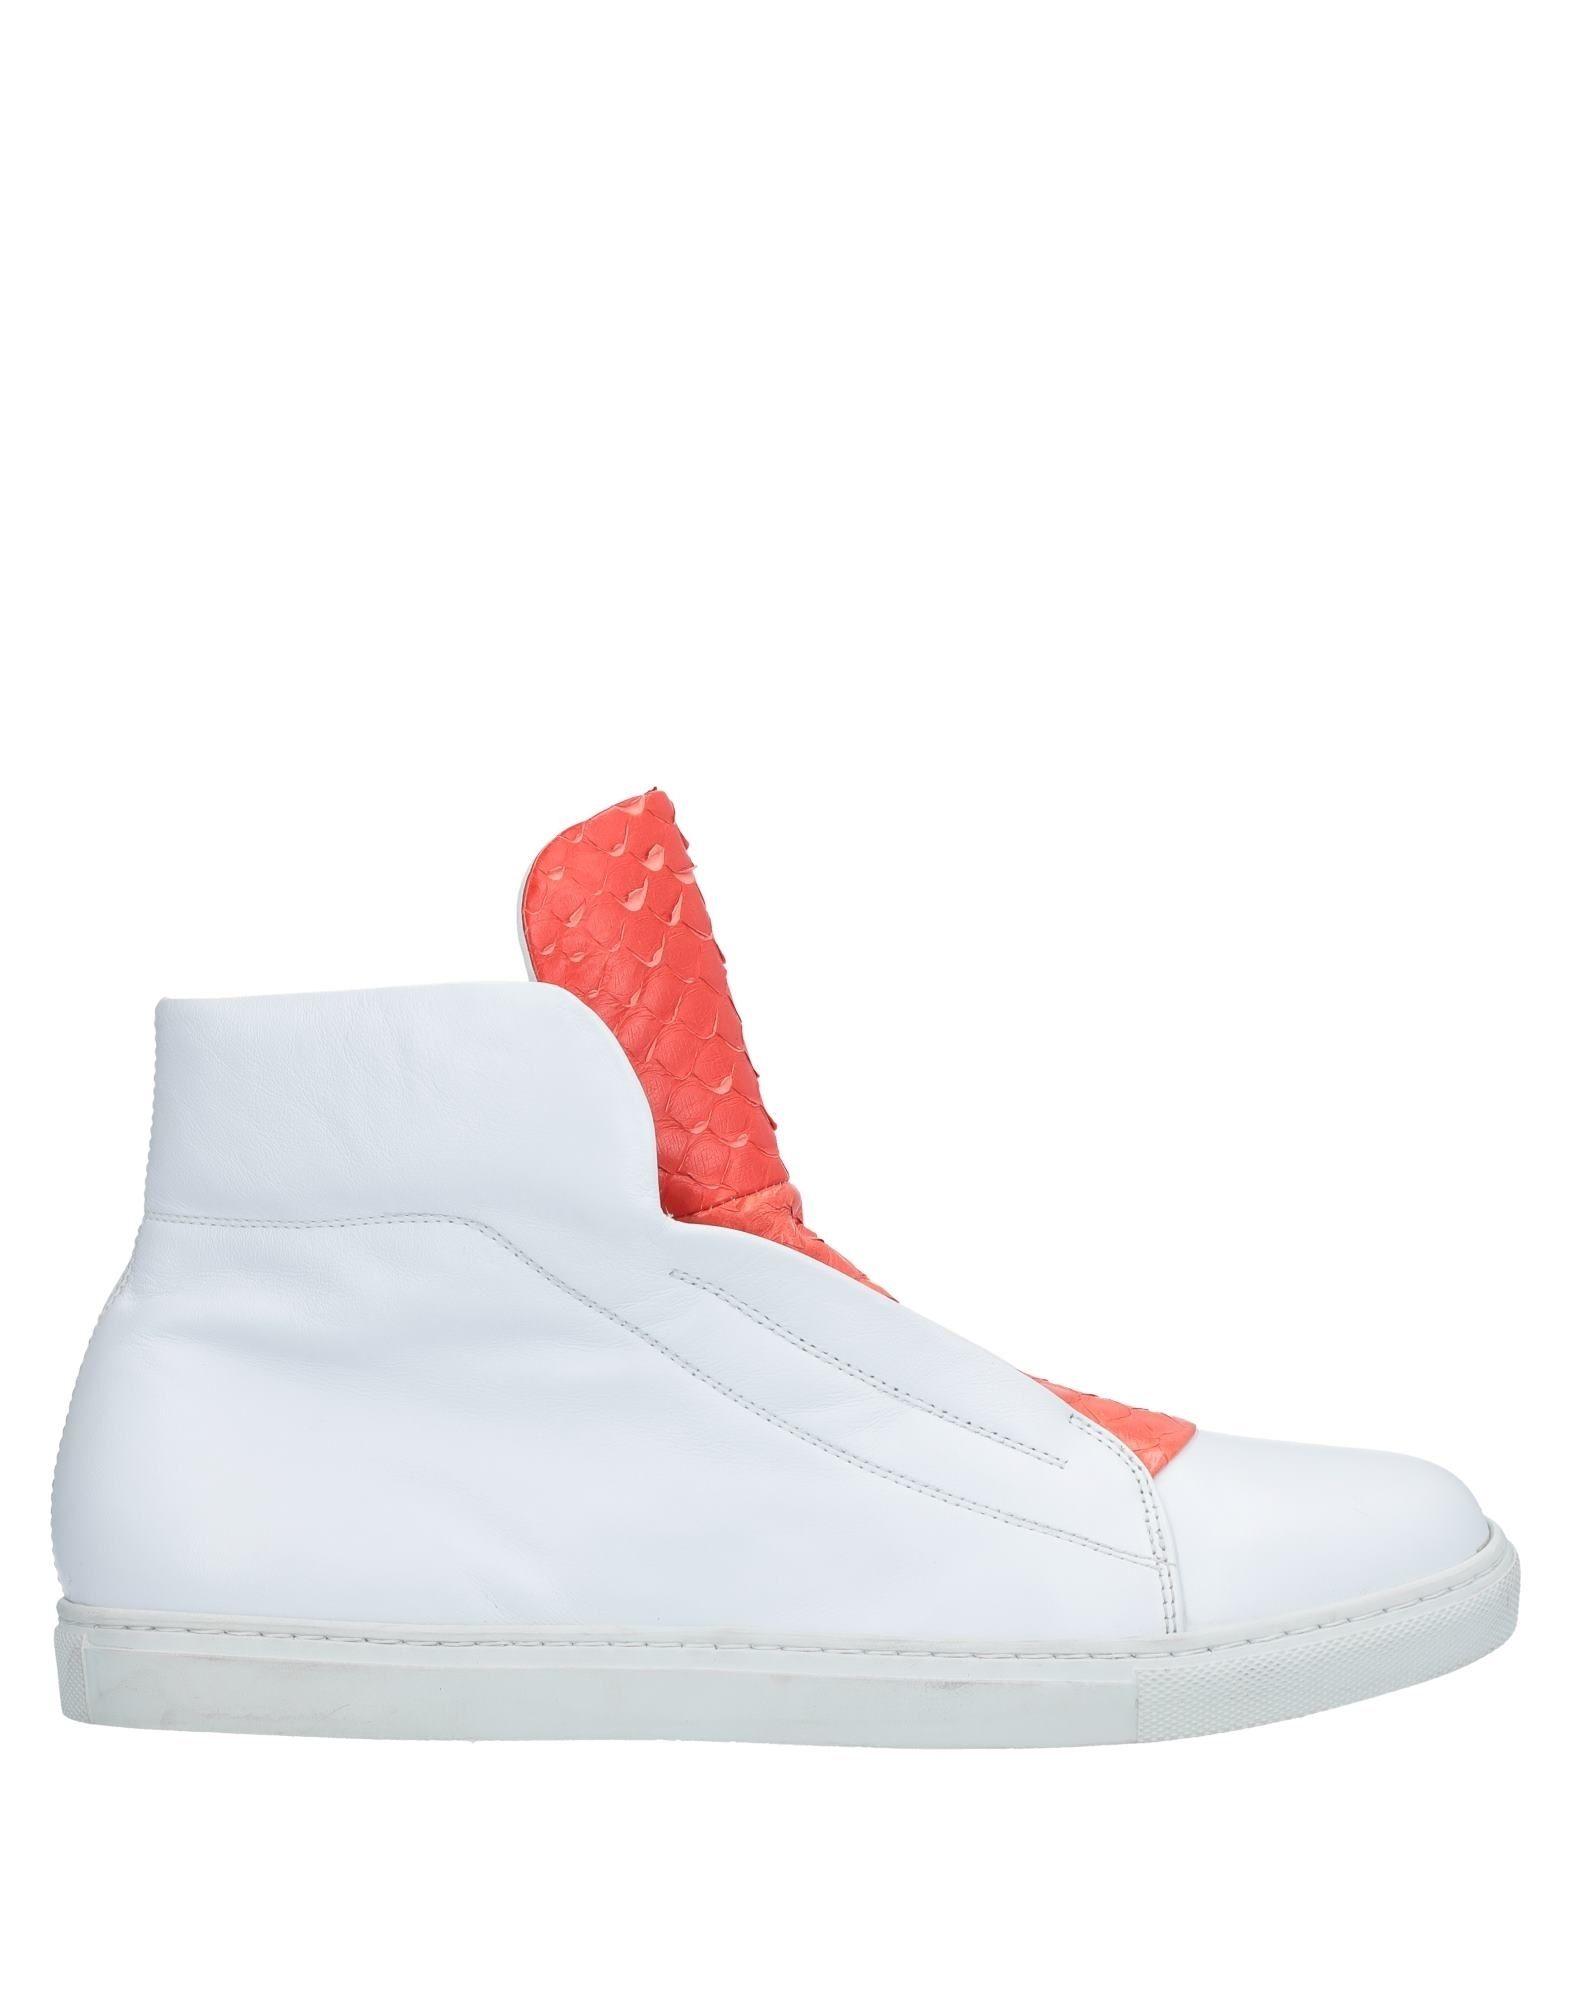 Alberto Moretti Sneakers Damen    11533416PWGut aussehende strapazierfähige Schuhe c9aade